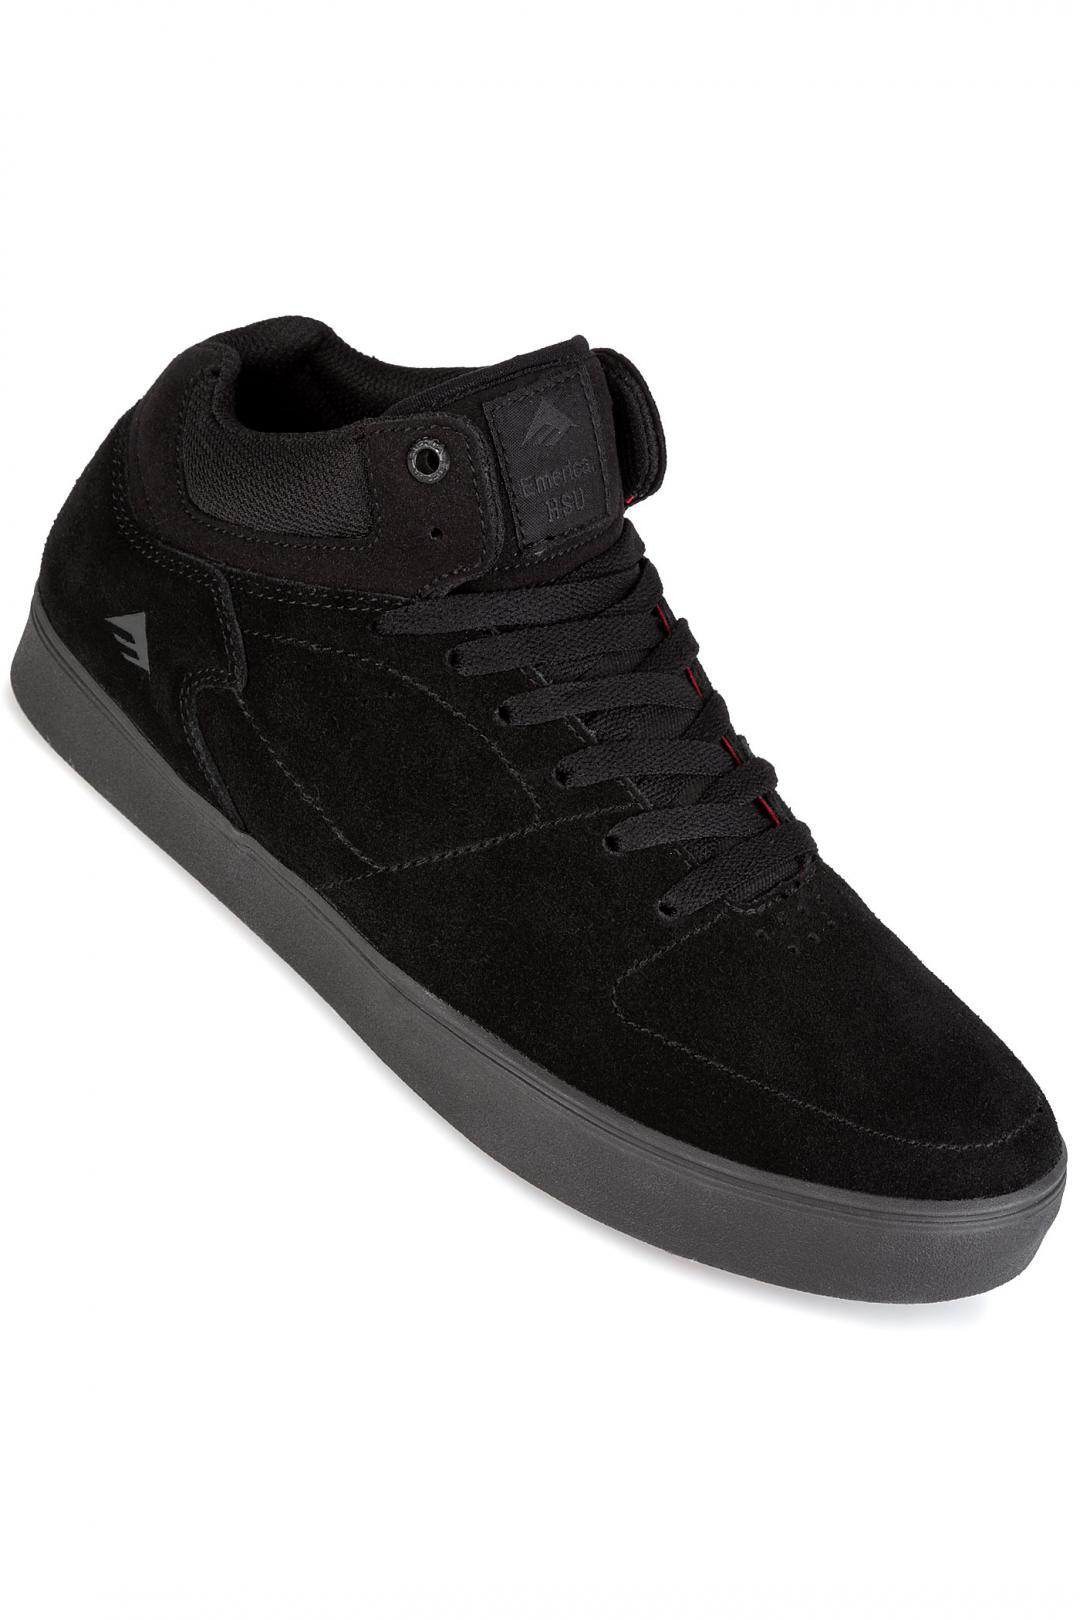 Uomo Emerica The HSU G6 black dark grey | Sneaker